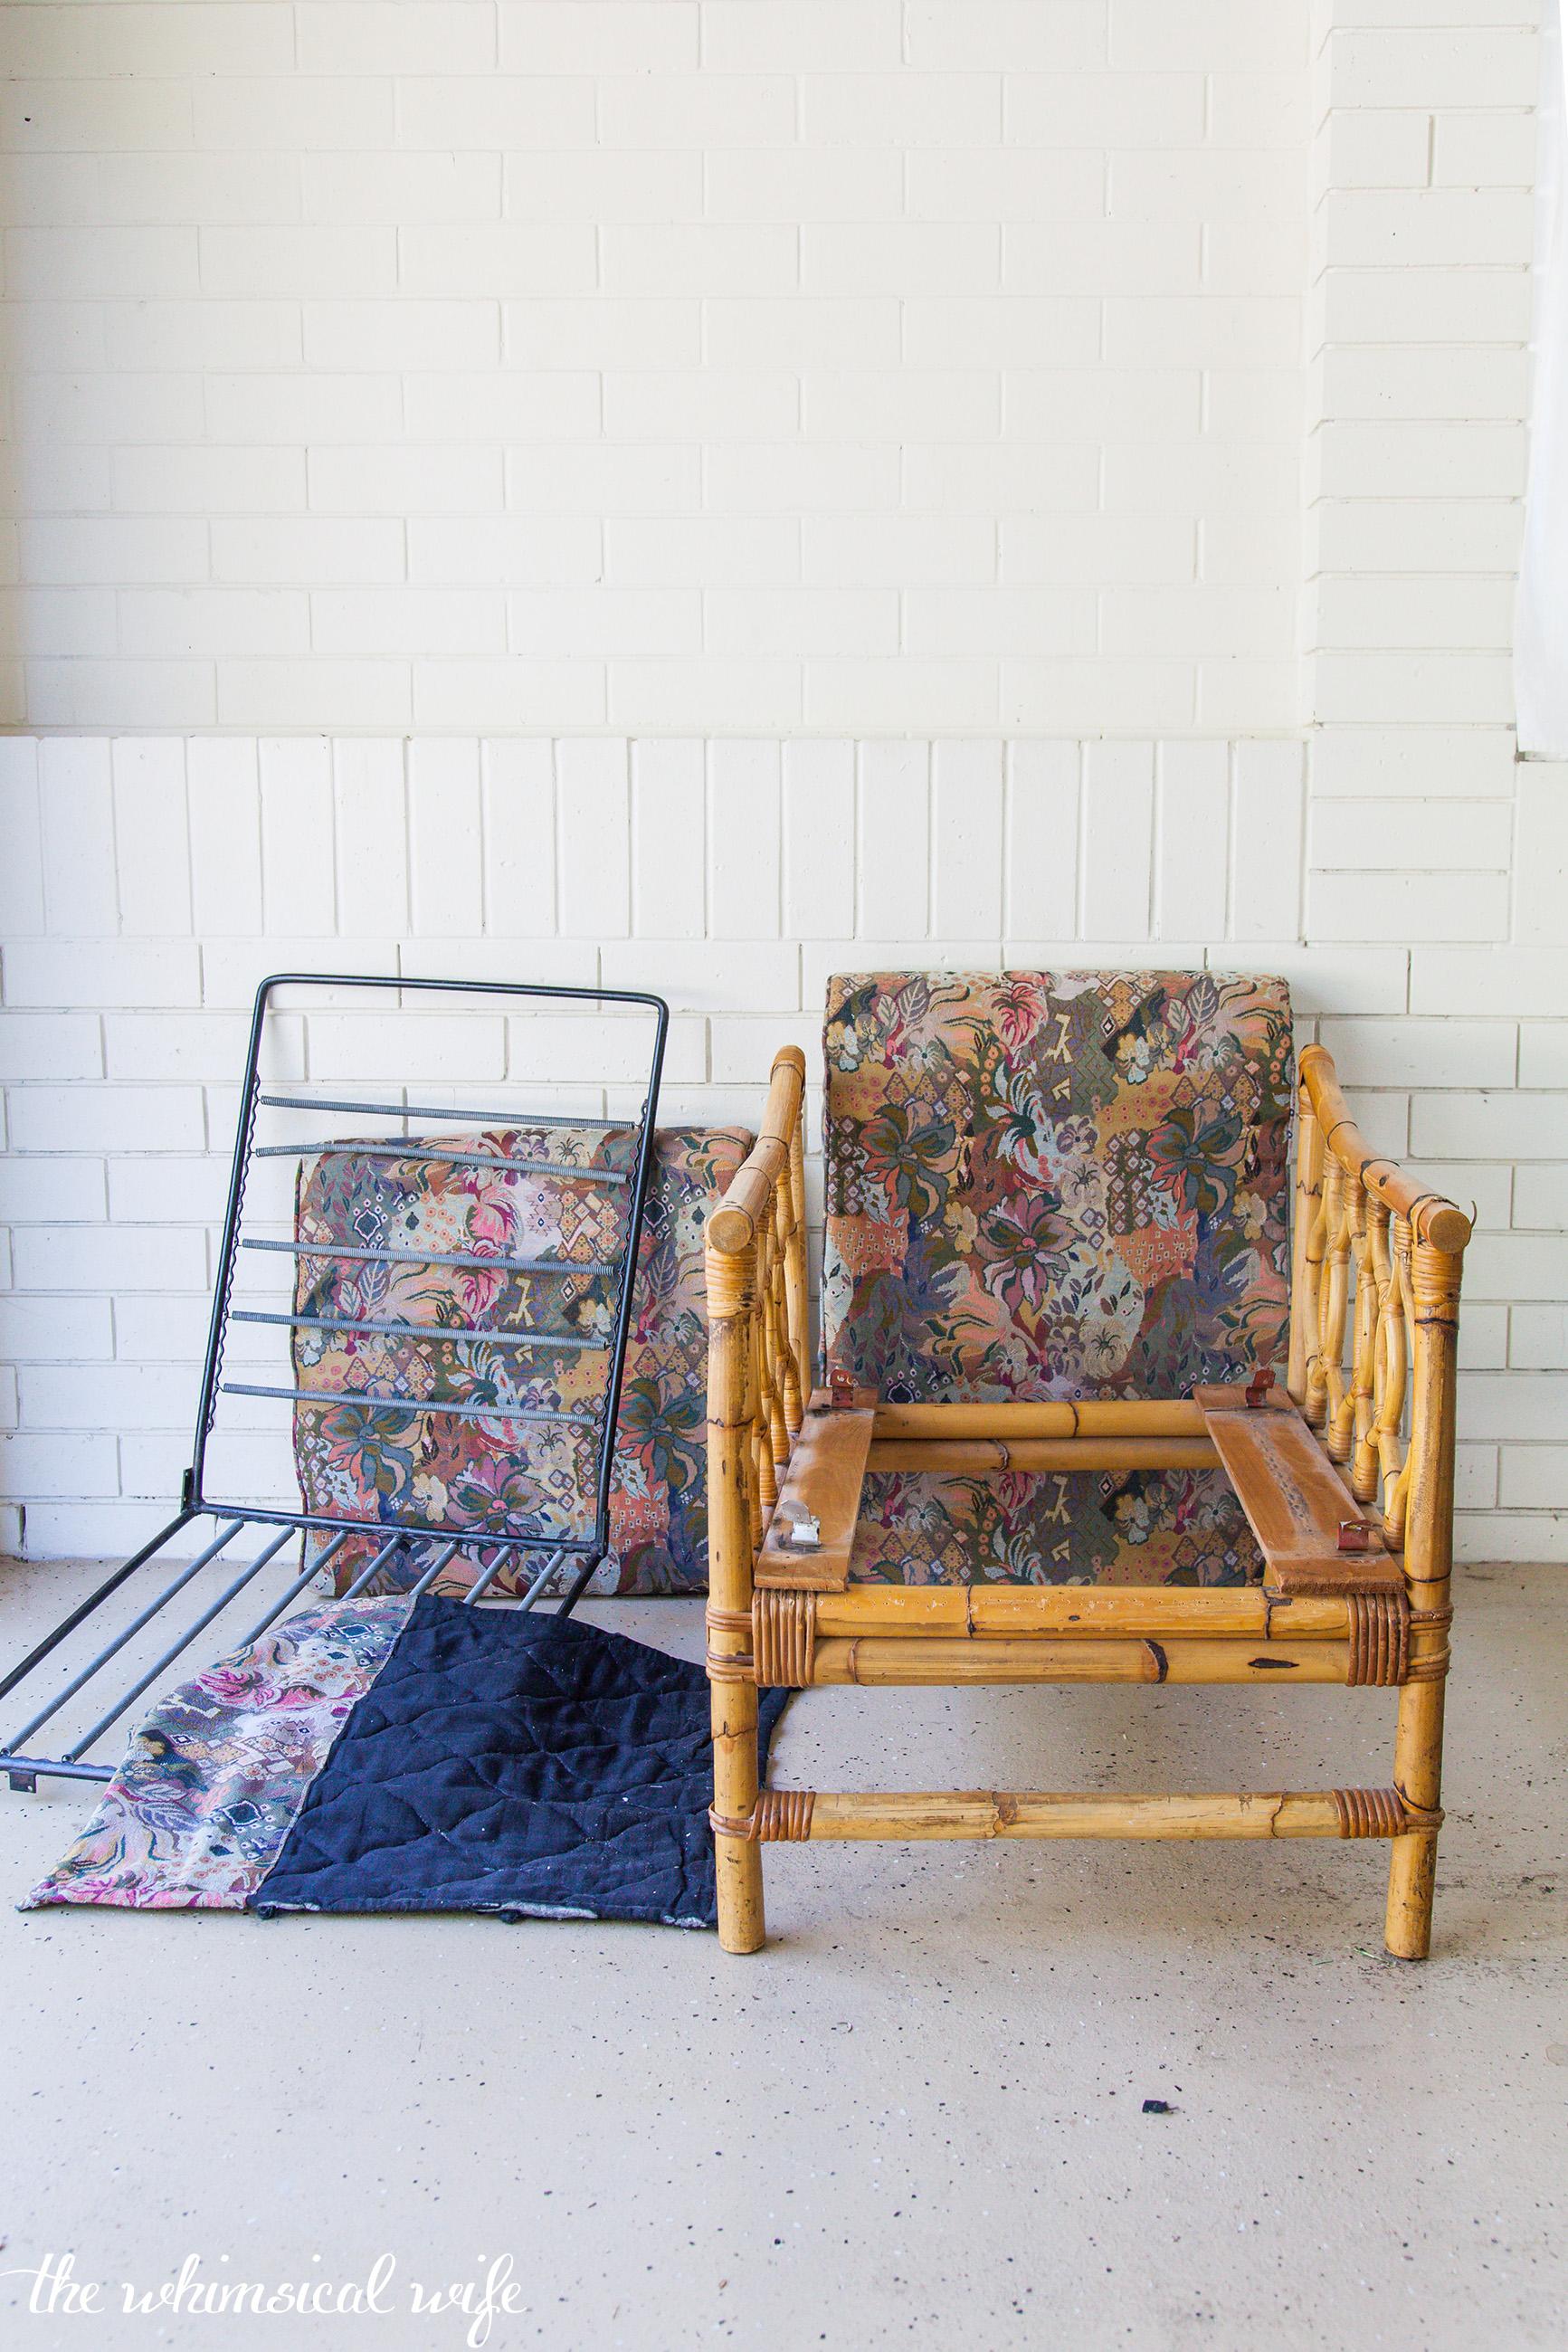 Bamboo Chair-3339.jpg